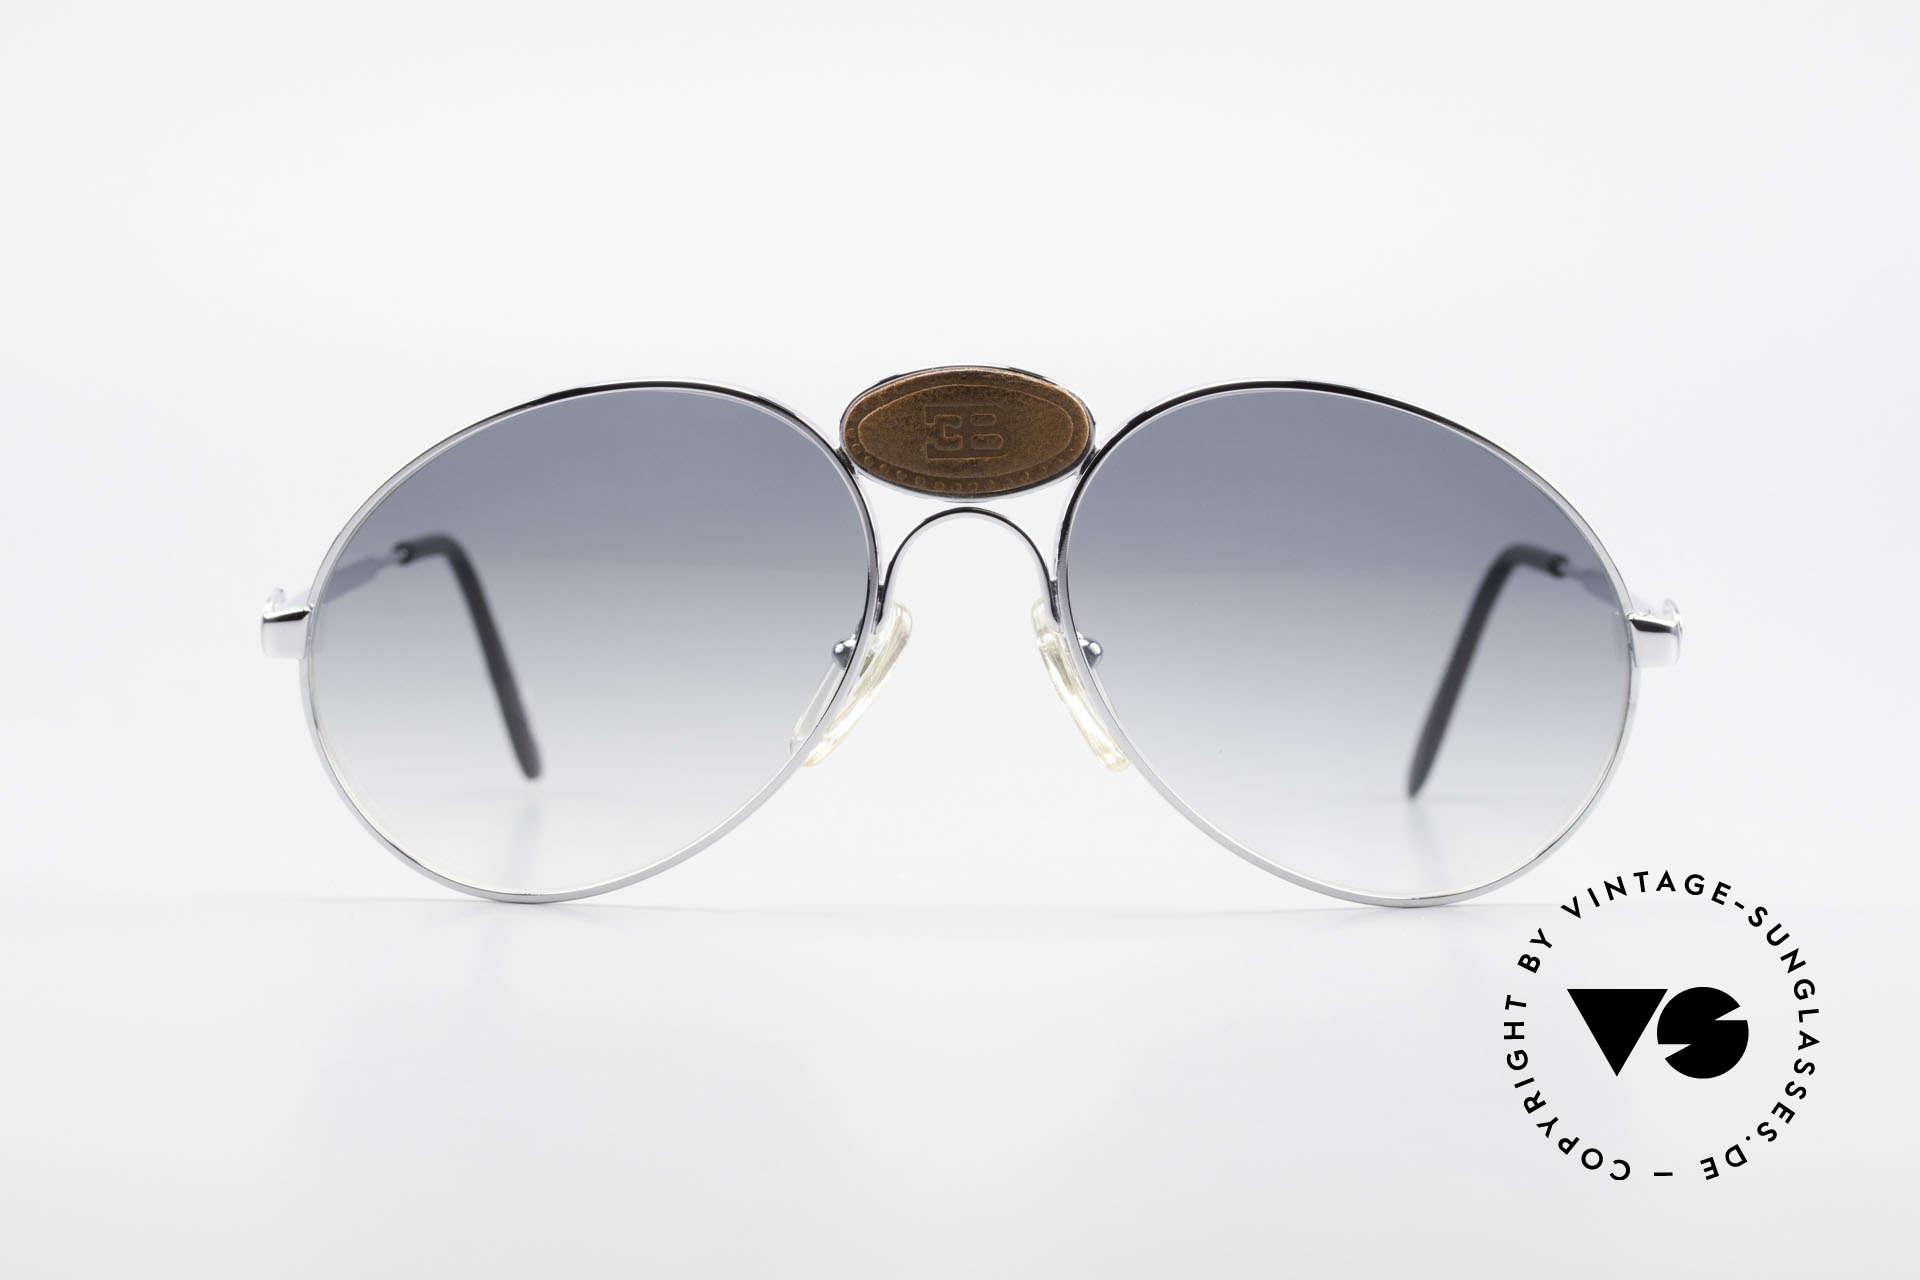 Bugatti 64745 Rare Collector's Sunglasses, true rarity from the late 1970's (collector's glasses), Made for Men